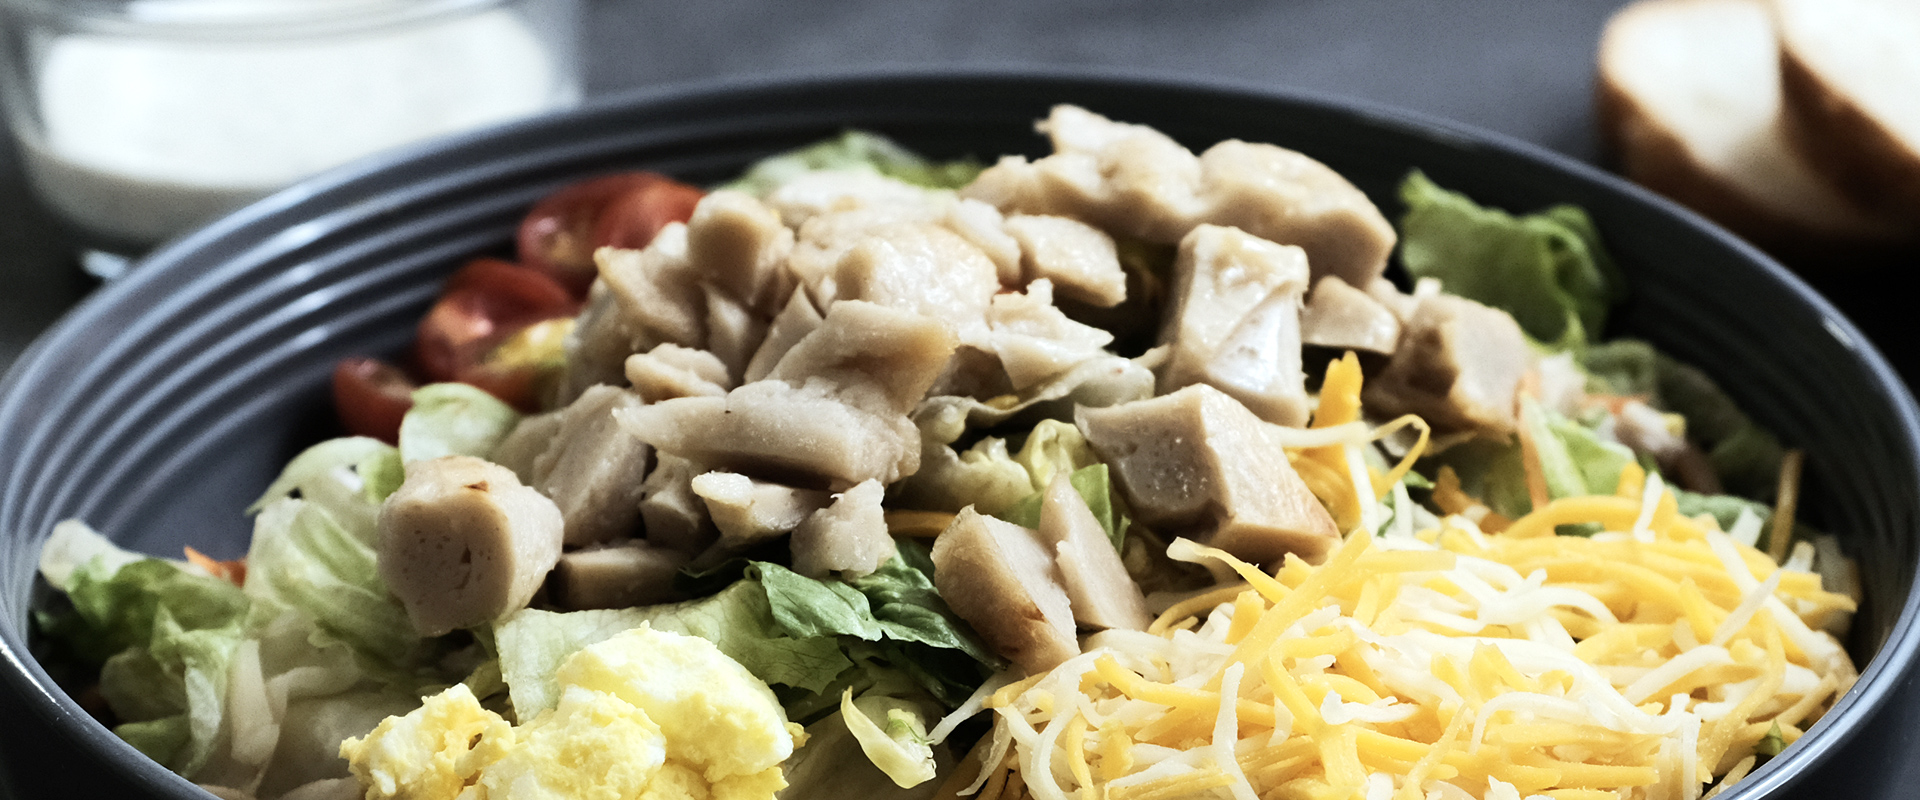 PAOW! Cobb Salad